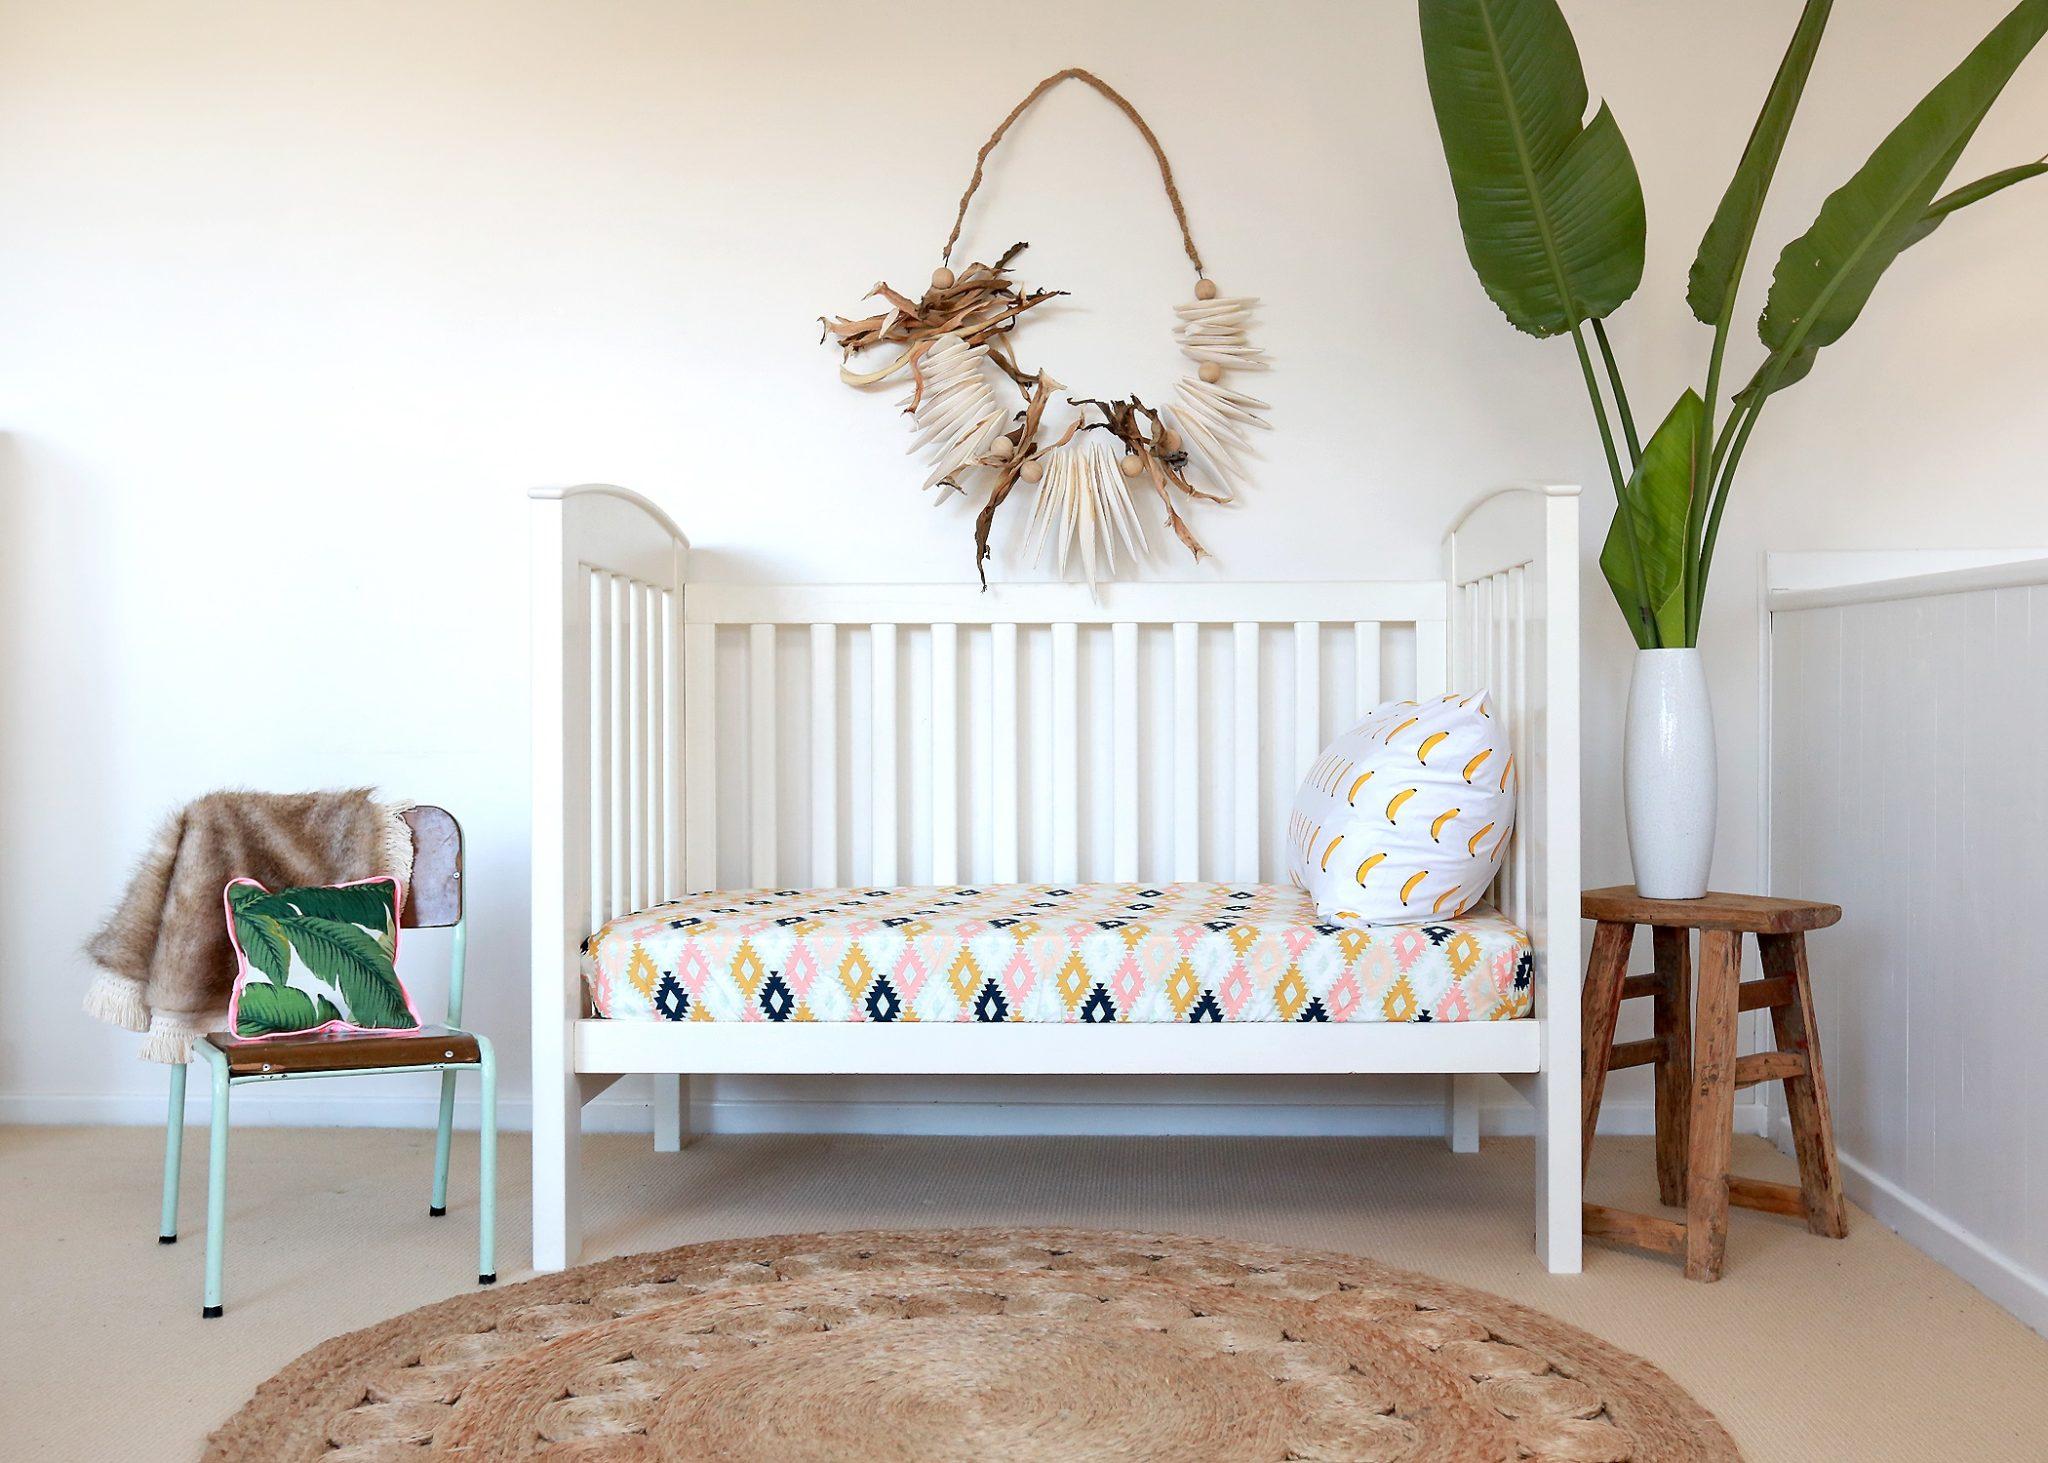 Boho nursery, kids rooms inspiration